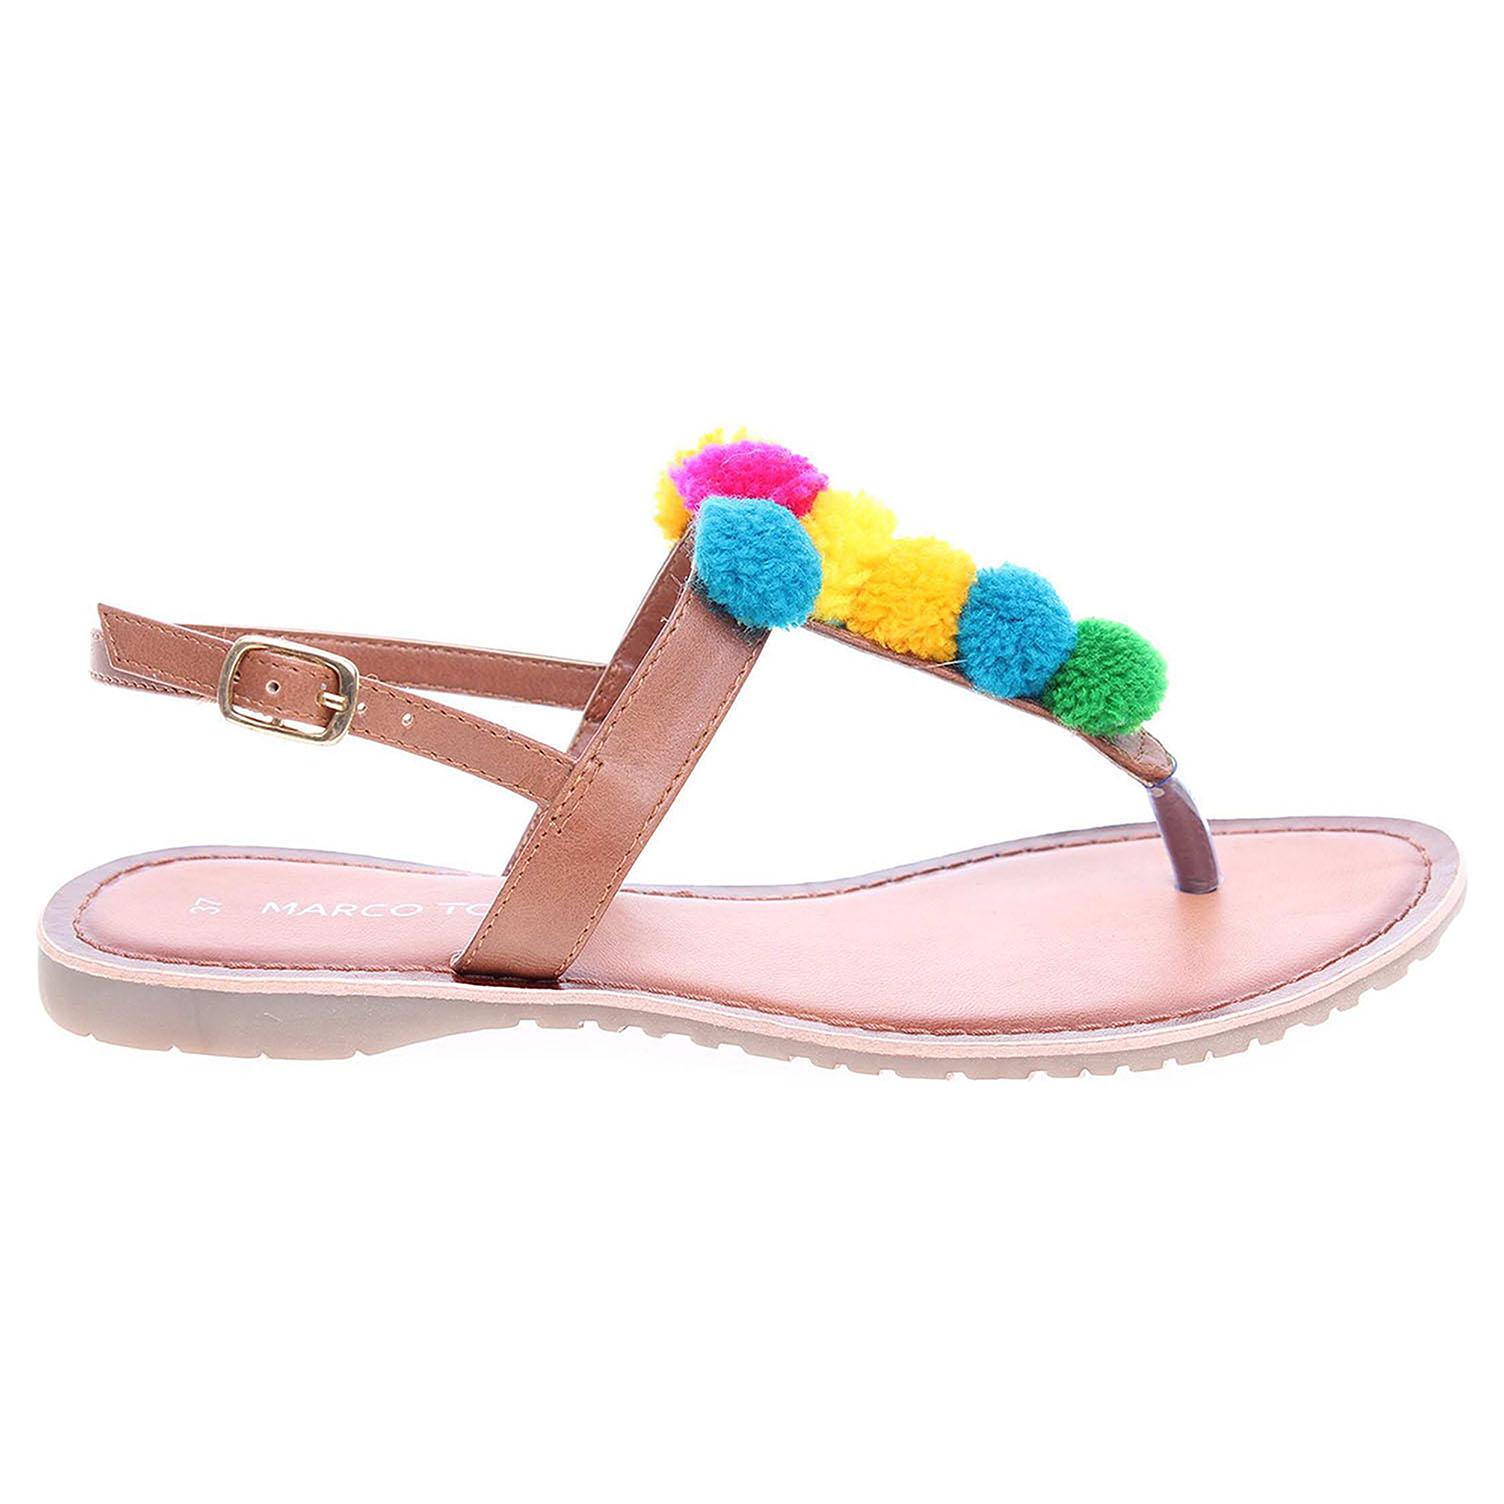 Ecco Marco Tozzi dámské sandály 2-28127-28 hnědé 23801213